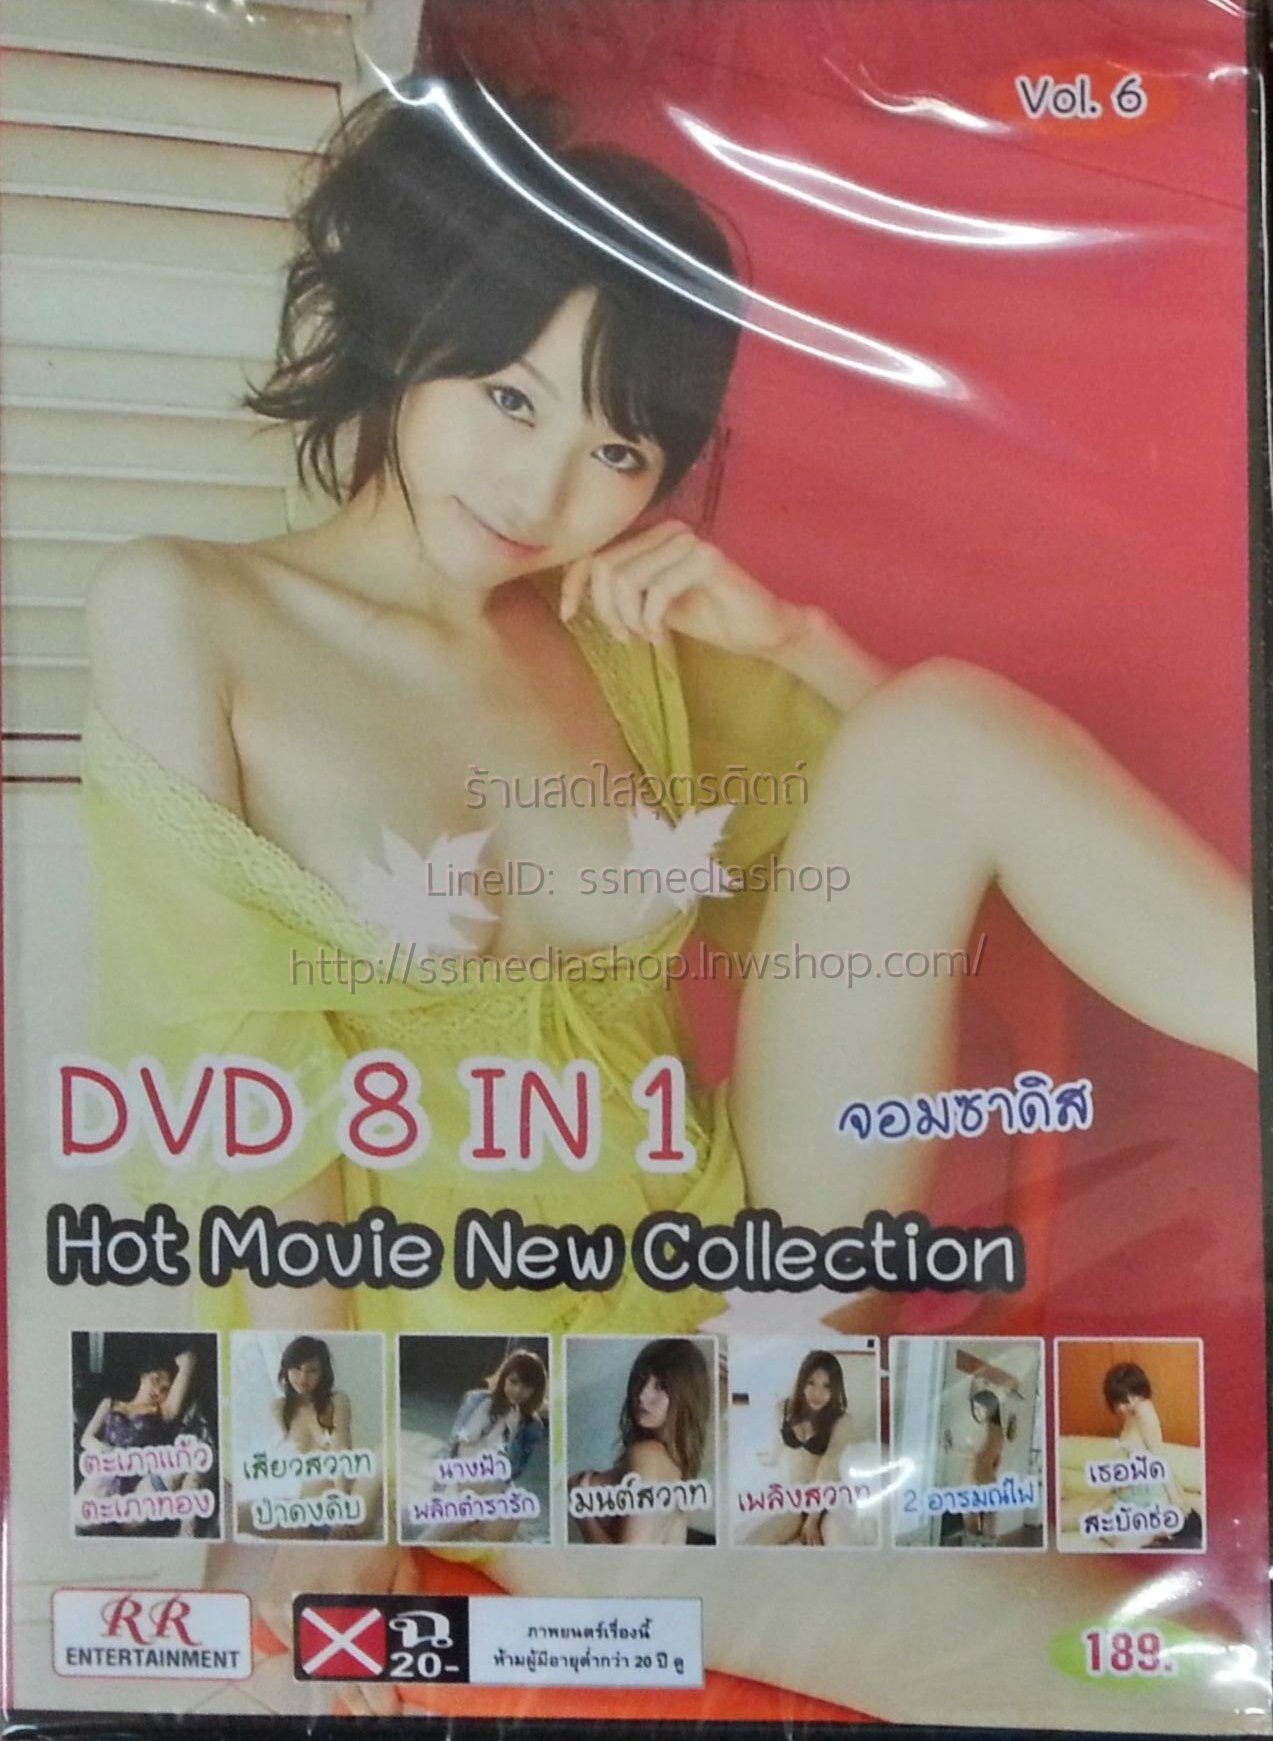 DVD หนังอิโรติค 8in1 Hot movie new collection vol.6